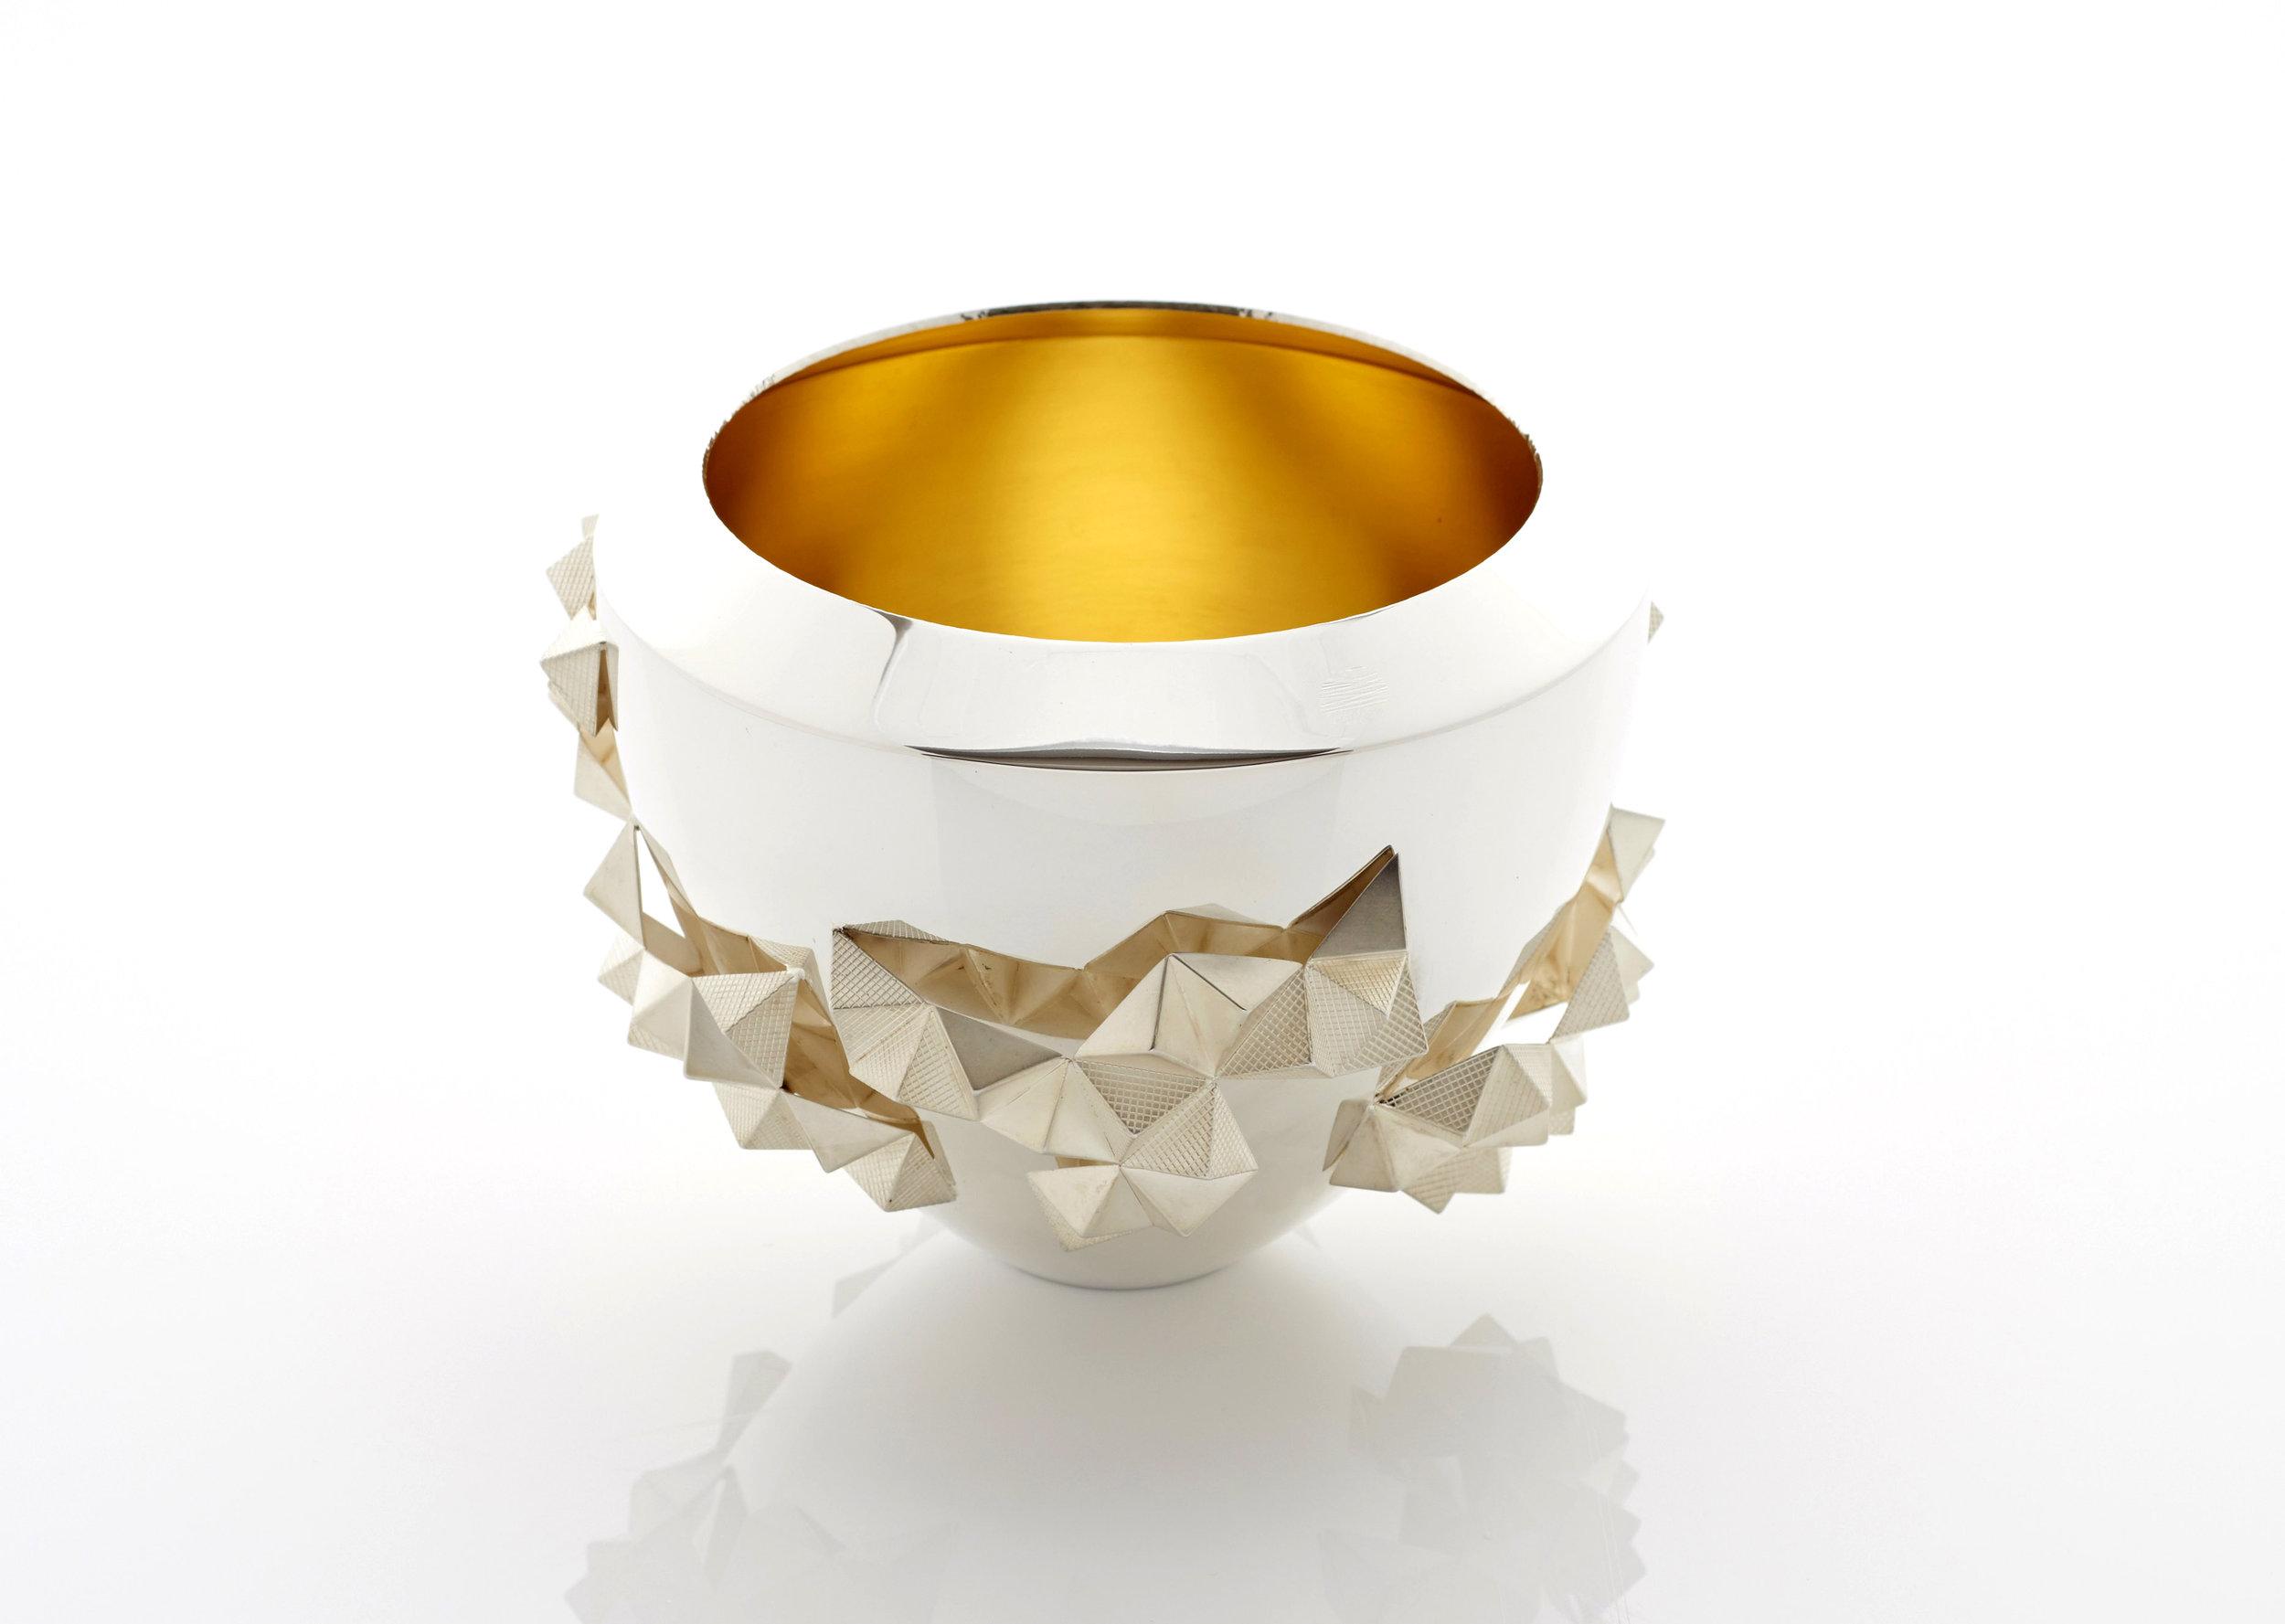 KJ - Silver Trillion Bowl.jpg